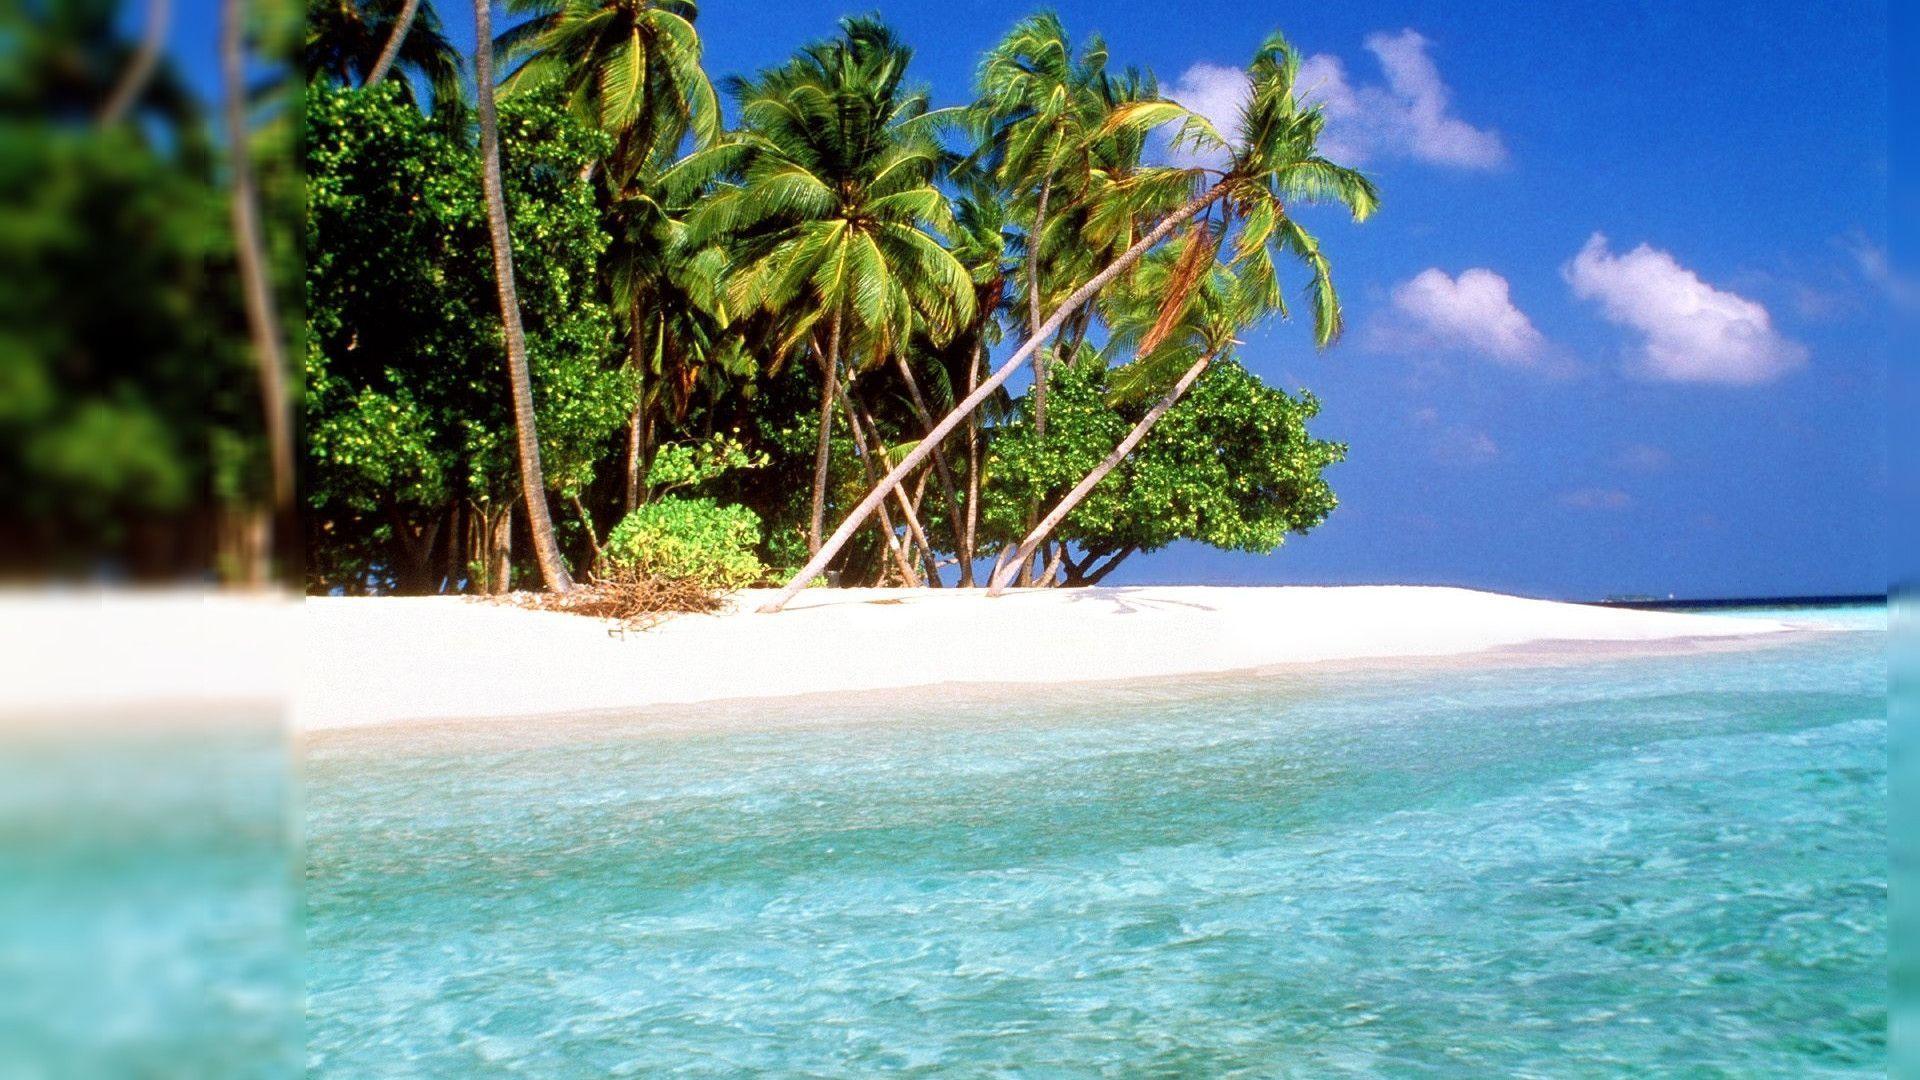 Hd Tropical Island Beach Paradise Wallpapers And Backgrounds: Tropical Wallpapers Desktop